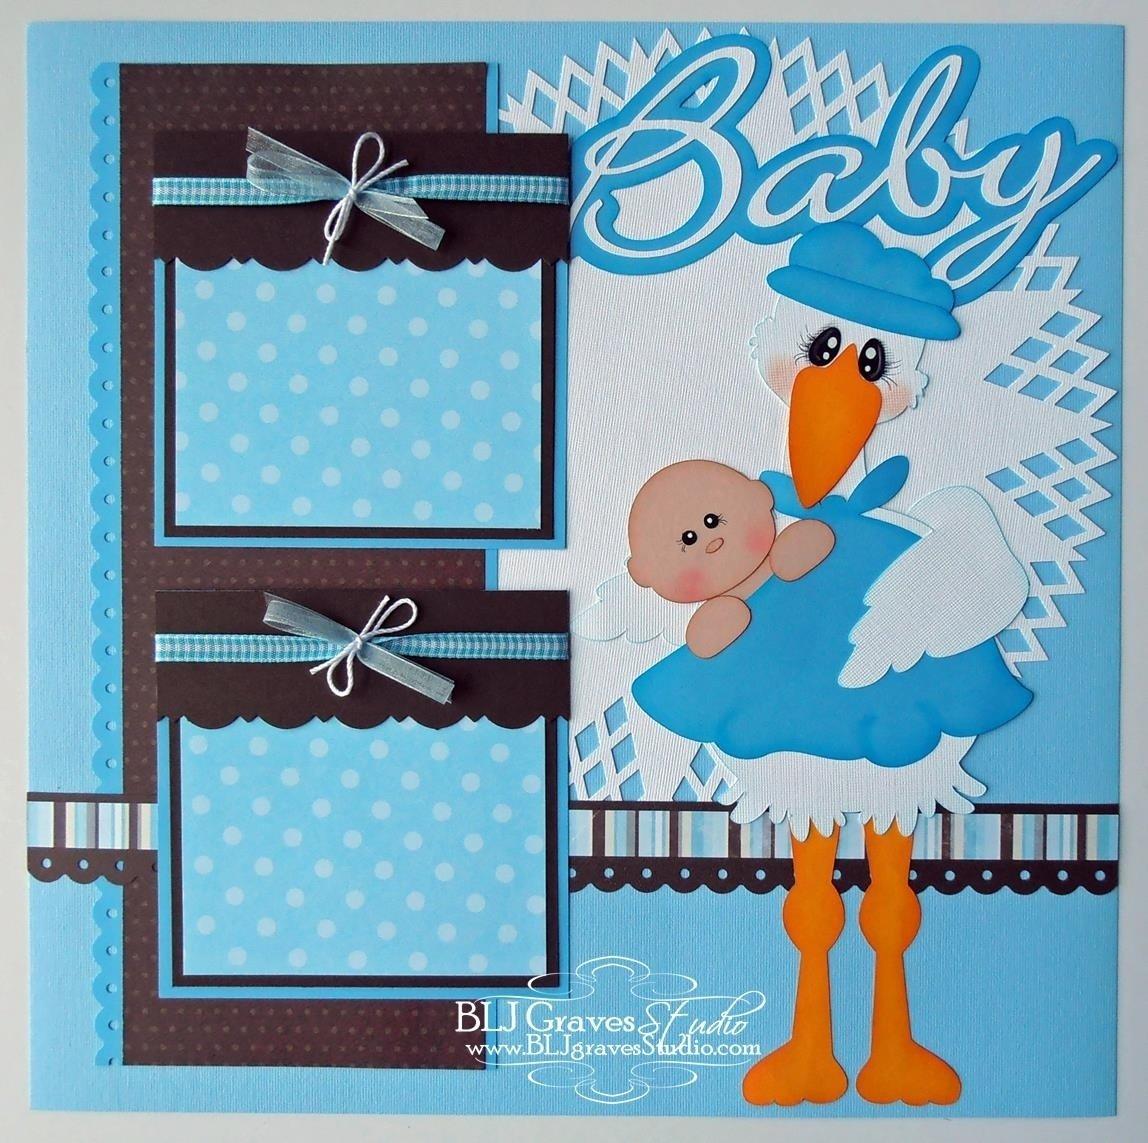 10 Fabulous Scrapbooking Ideas For Baby Boy fresh baby boy scrapbook ideas design scrapbook ideas 2018 1 2021